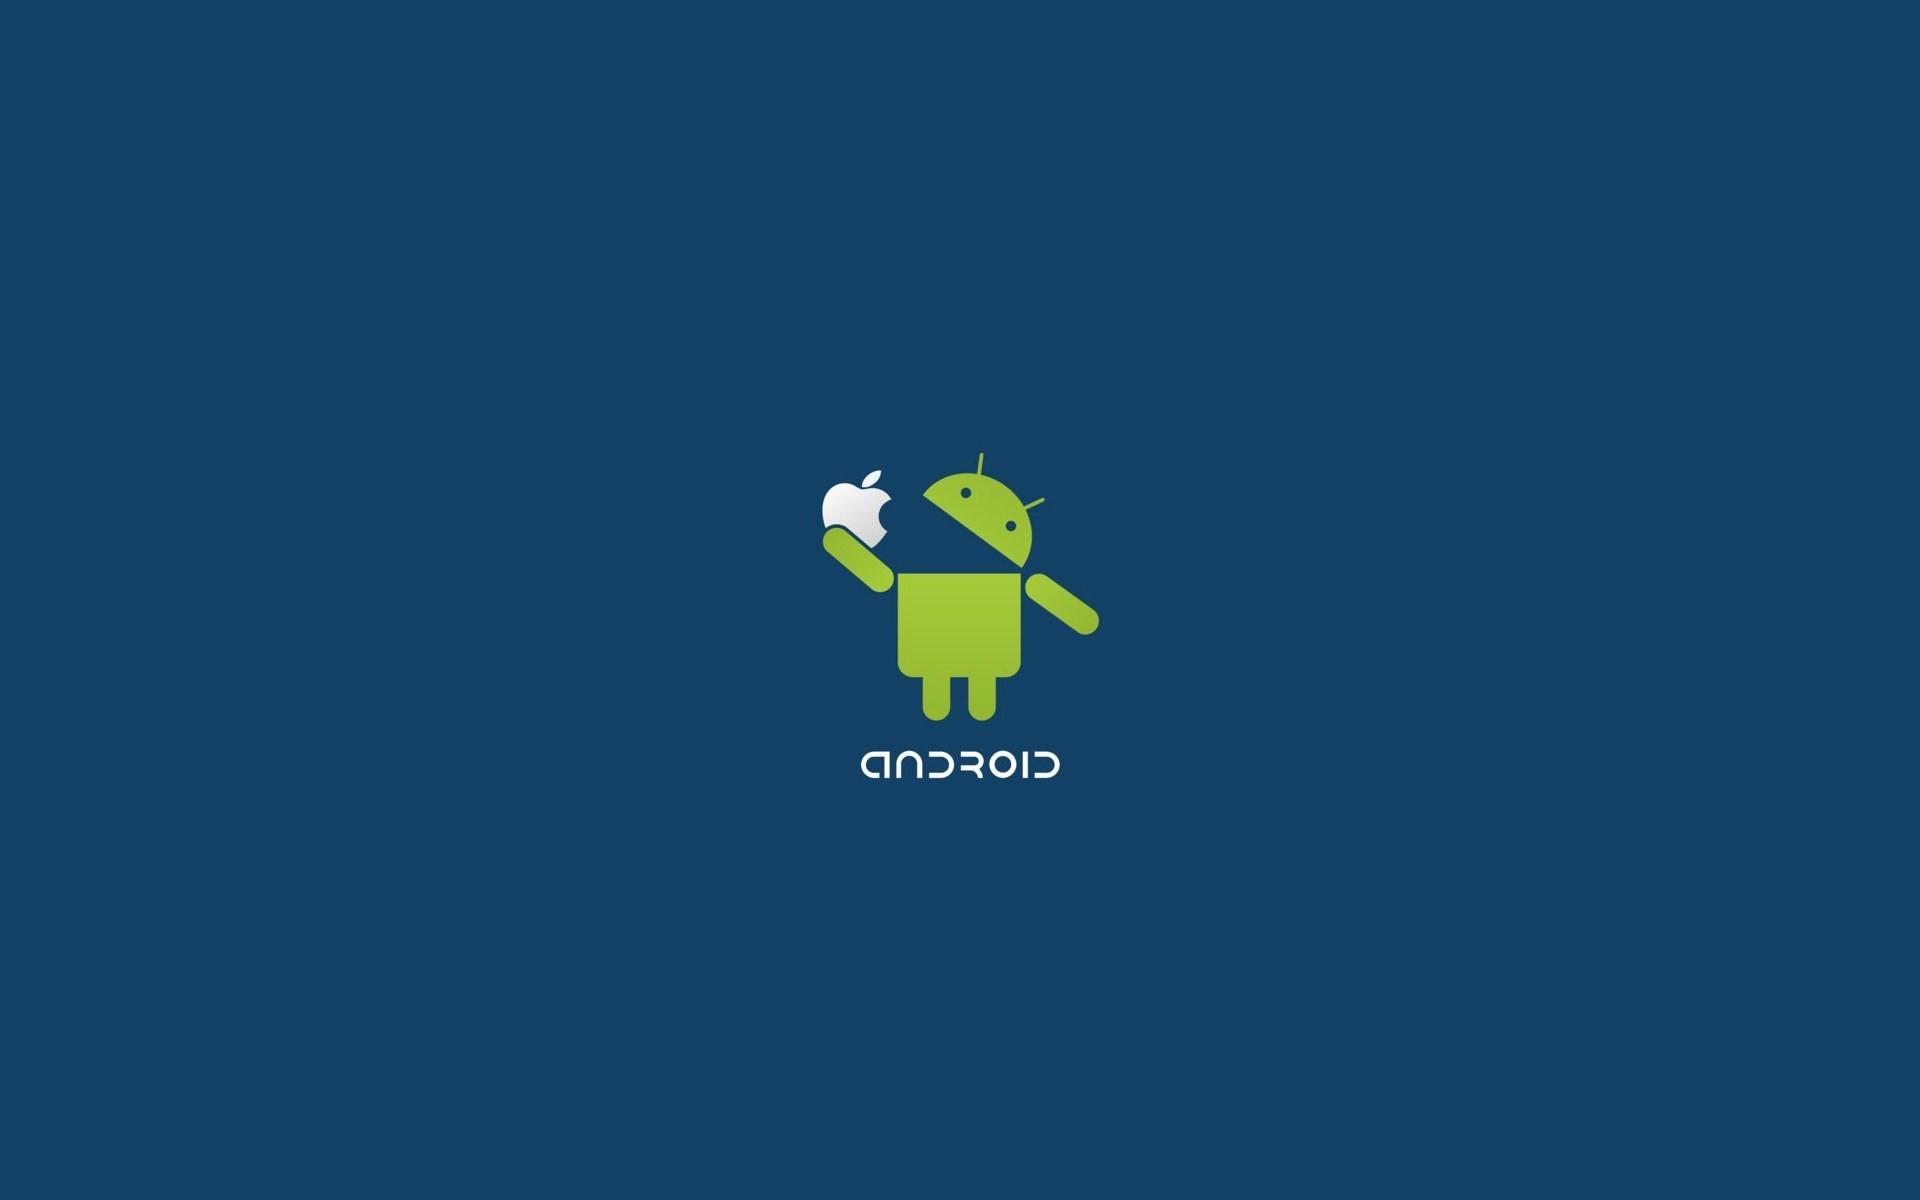 Android Logo Eat Apple Funny Desktop Wallpaper Uploaded by DesktopWalls